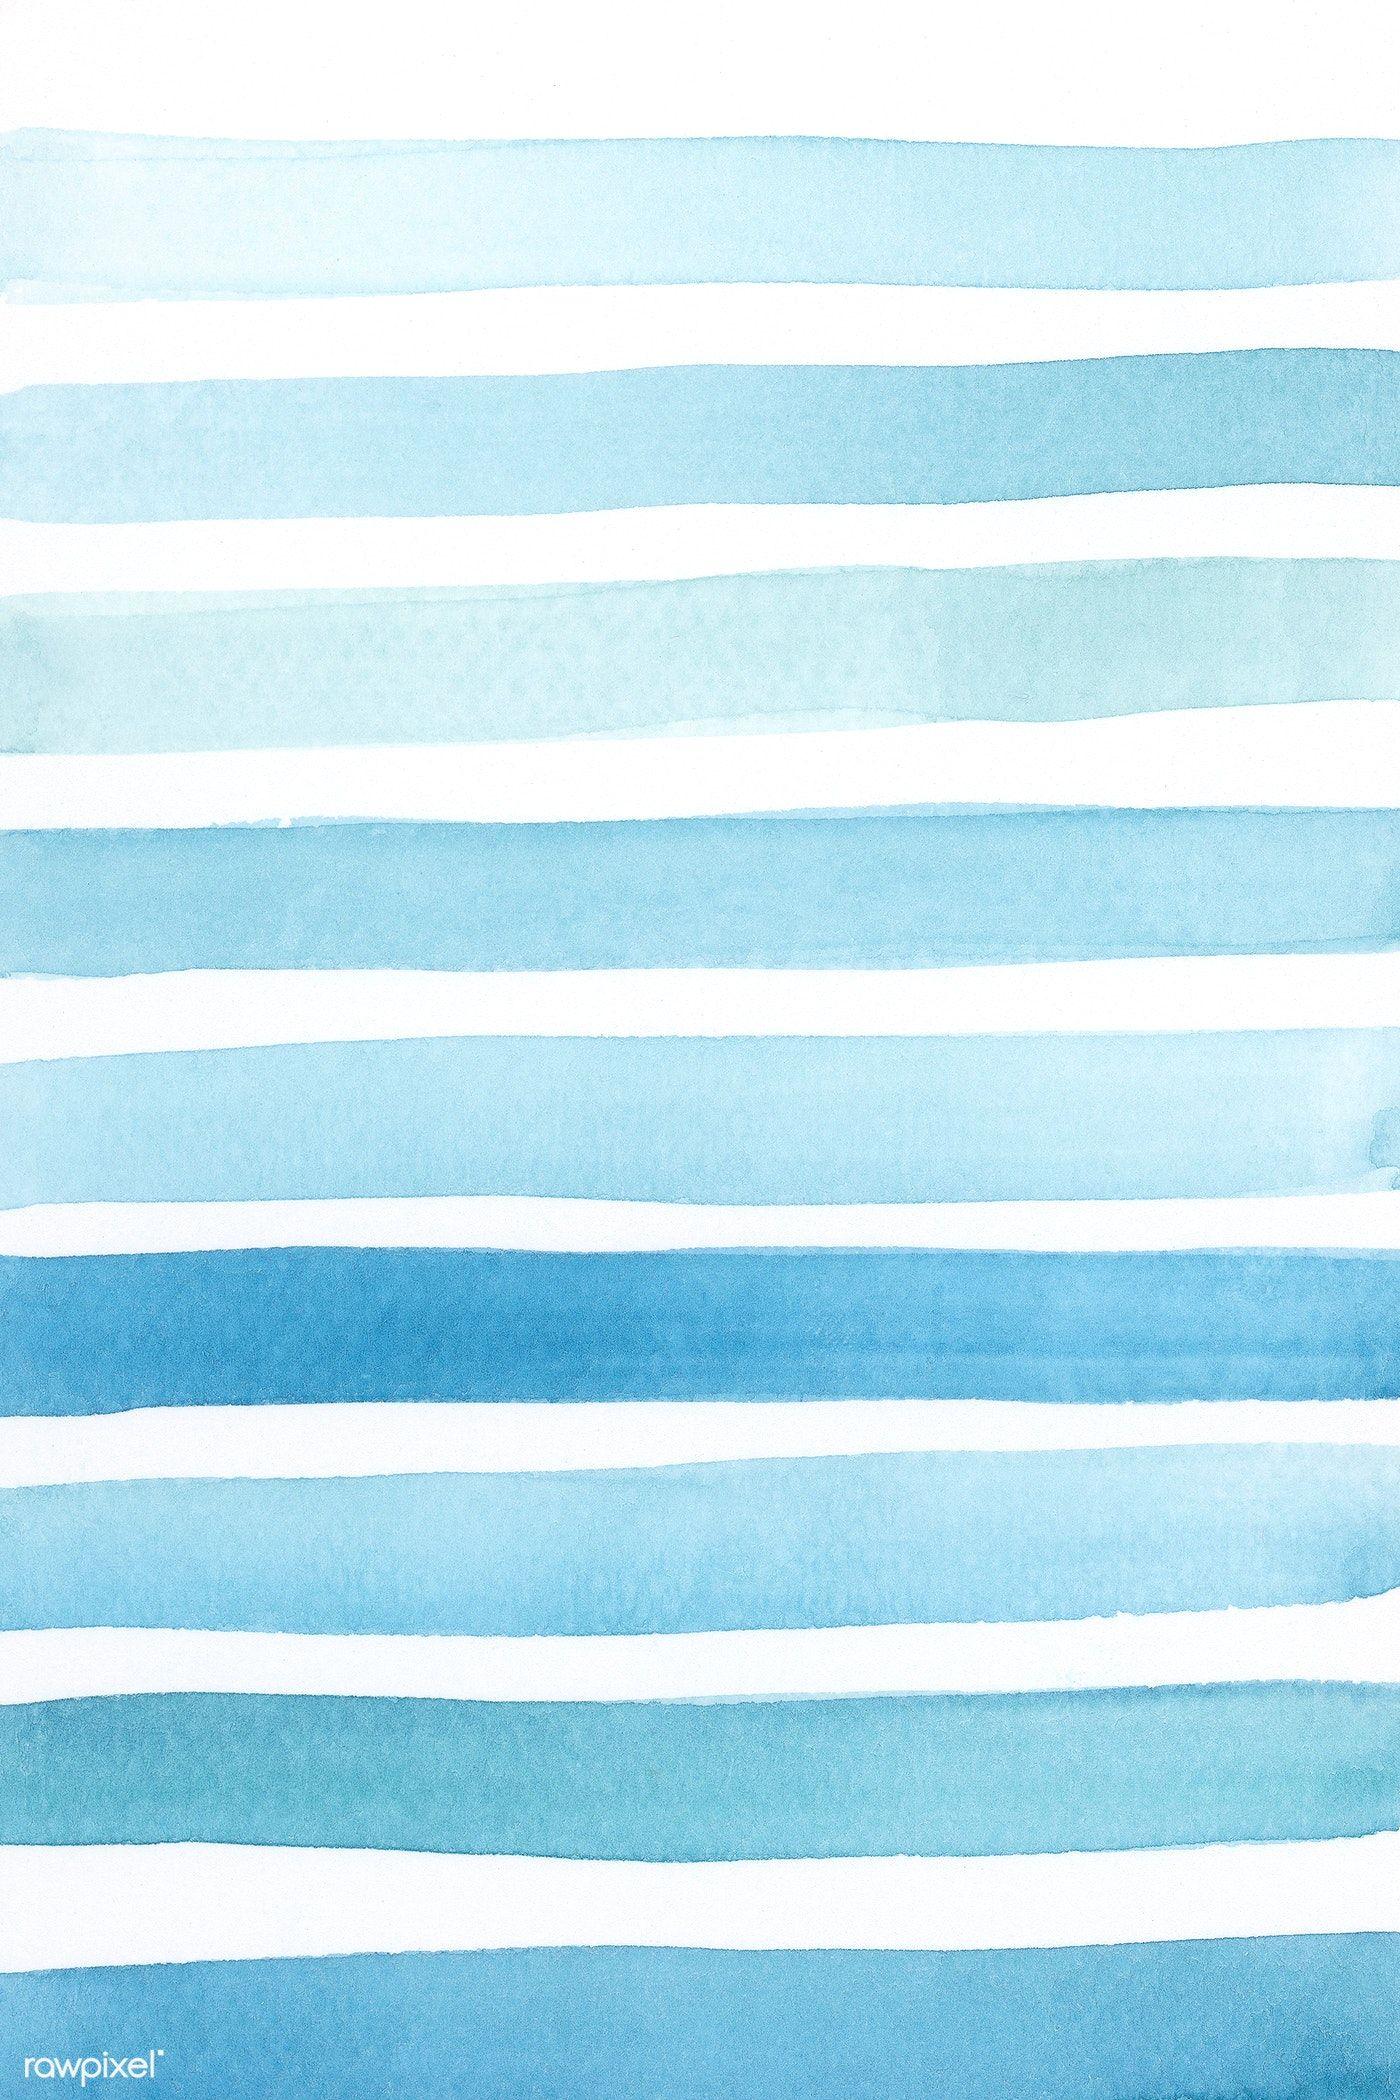 Download Premium Illustration Of Blue Watercolor Brush Stroke